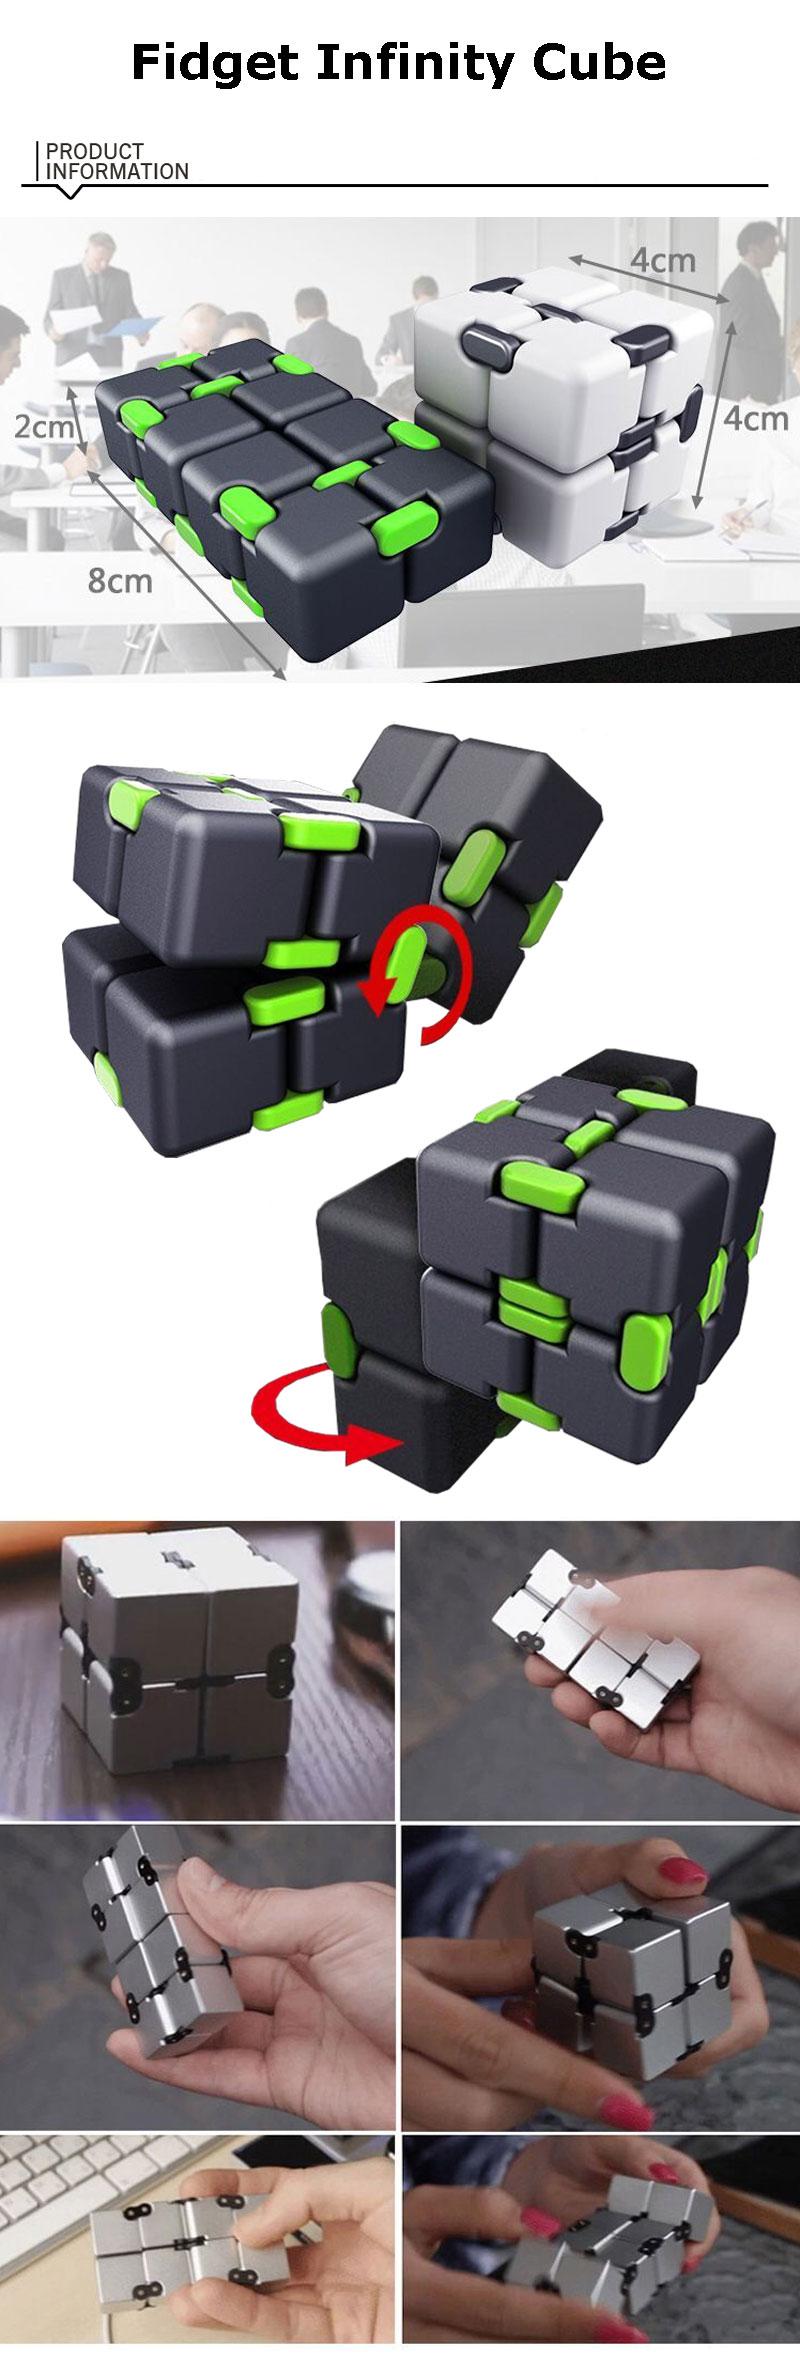 Infinity Cube 2 Metal High Quality EDC Creative Fidget Cube